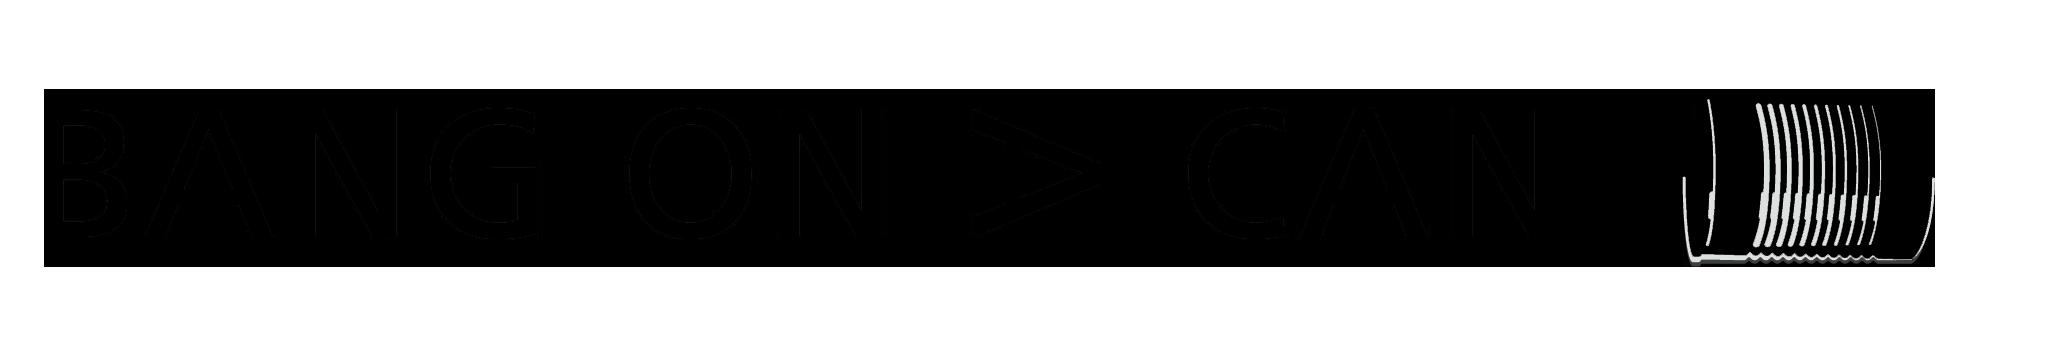 BOAC-Transp---BLACK.png